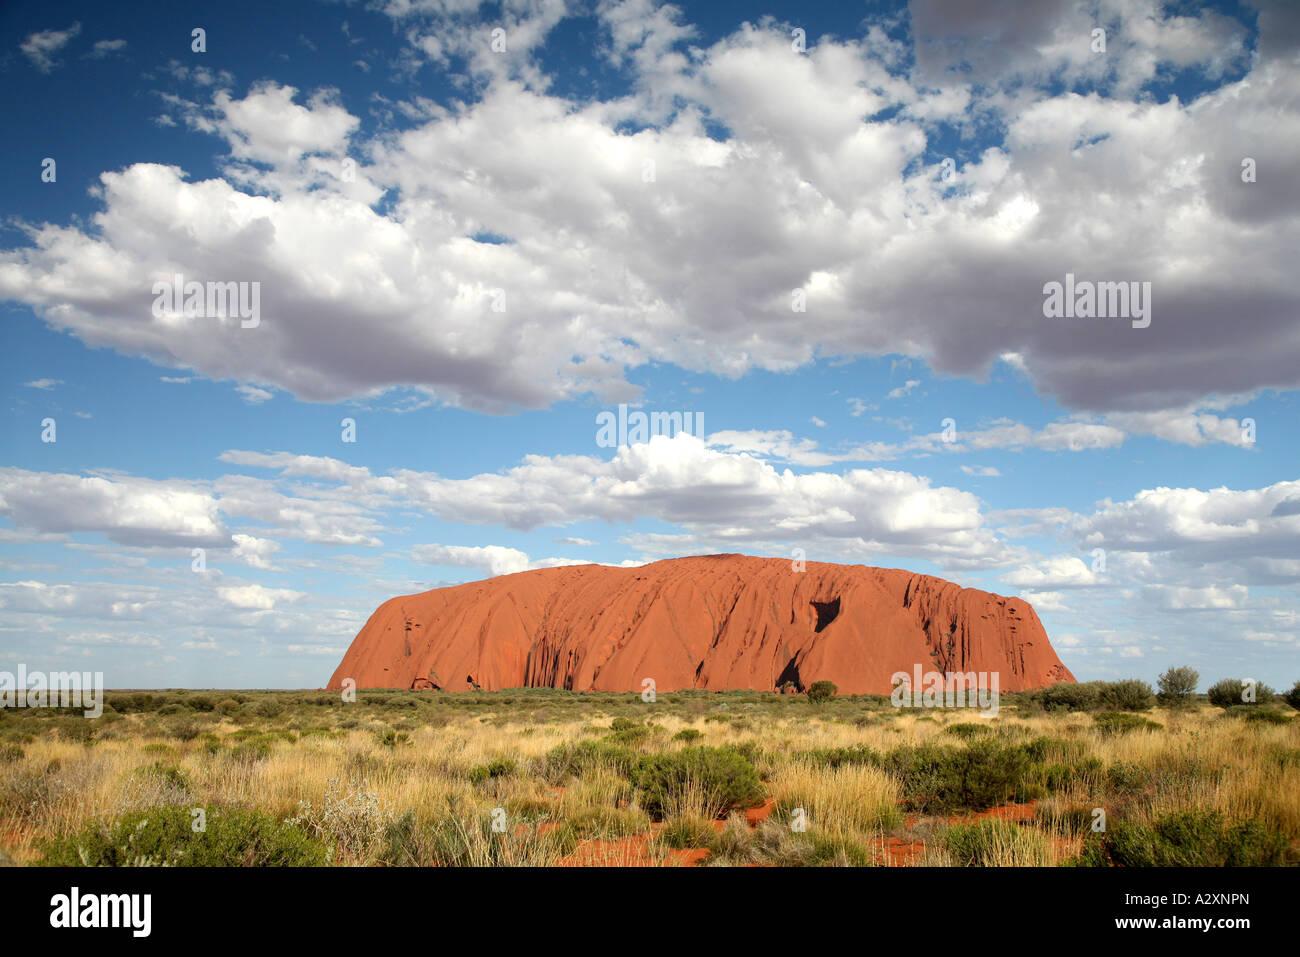 Ayers Rock - uluru - Northern Territory - Australia - Stock Image